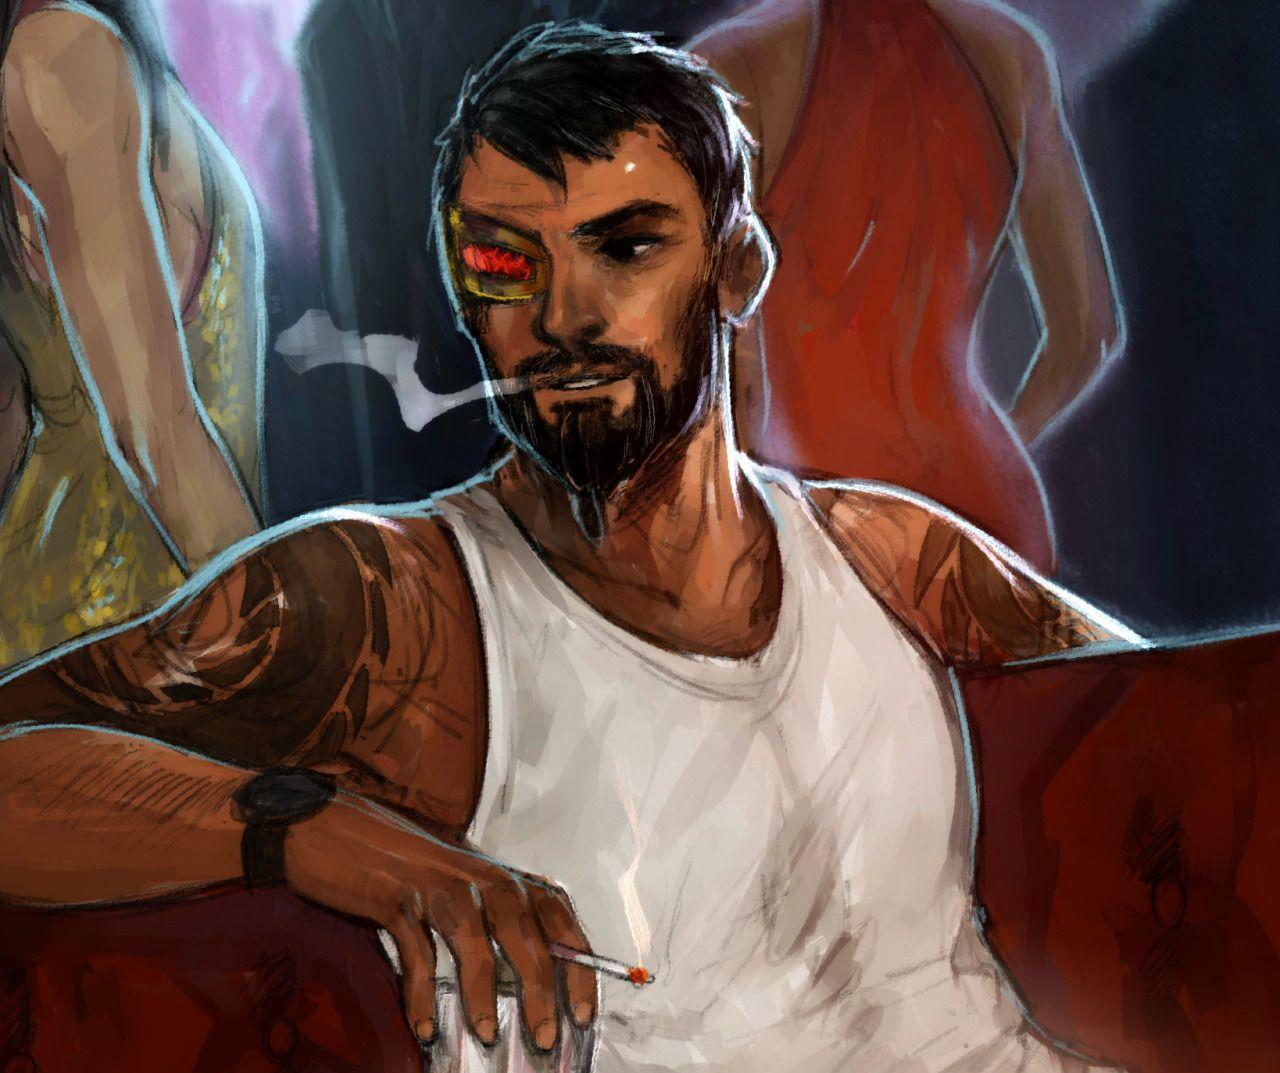 Pin by Popop on Игровые арты in 2020 Mortal kombat